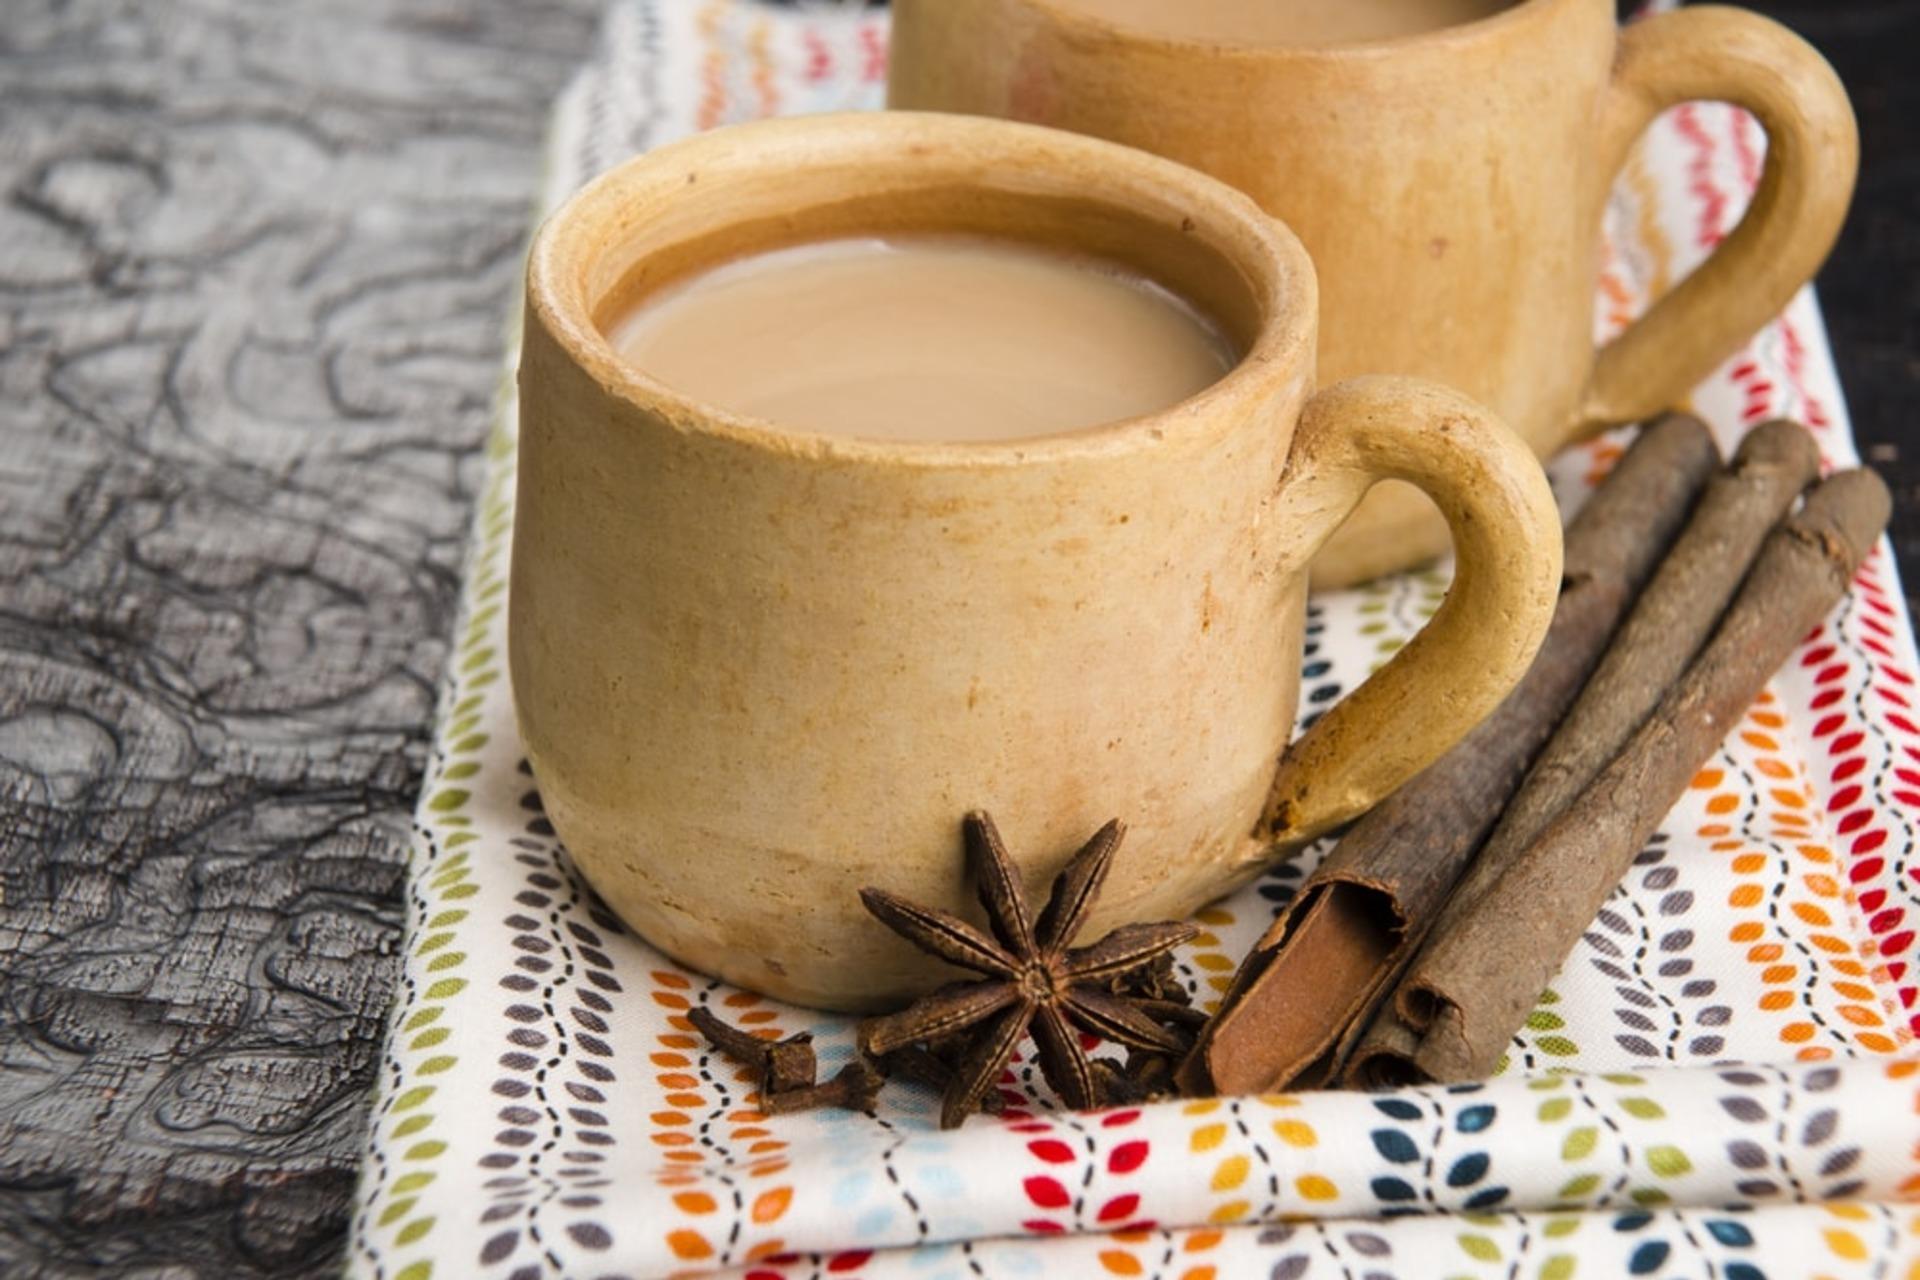 Чай масала в чашке